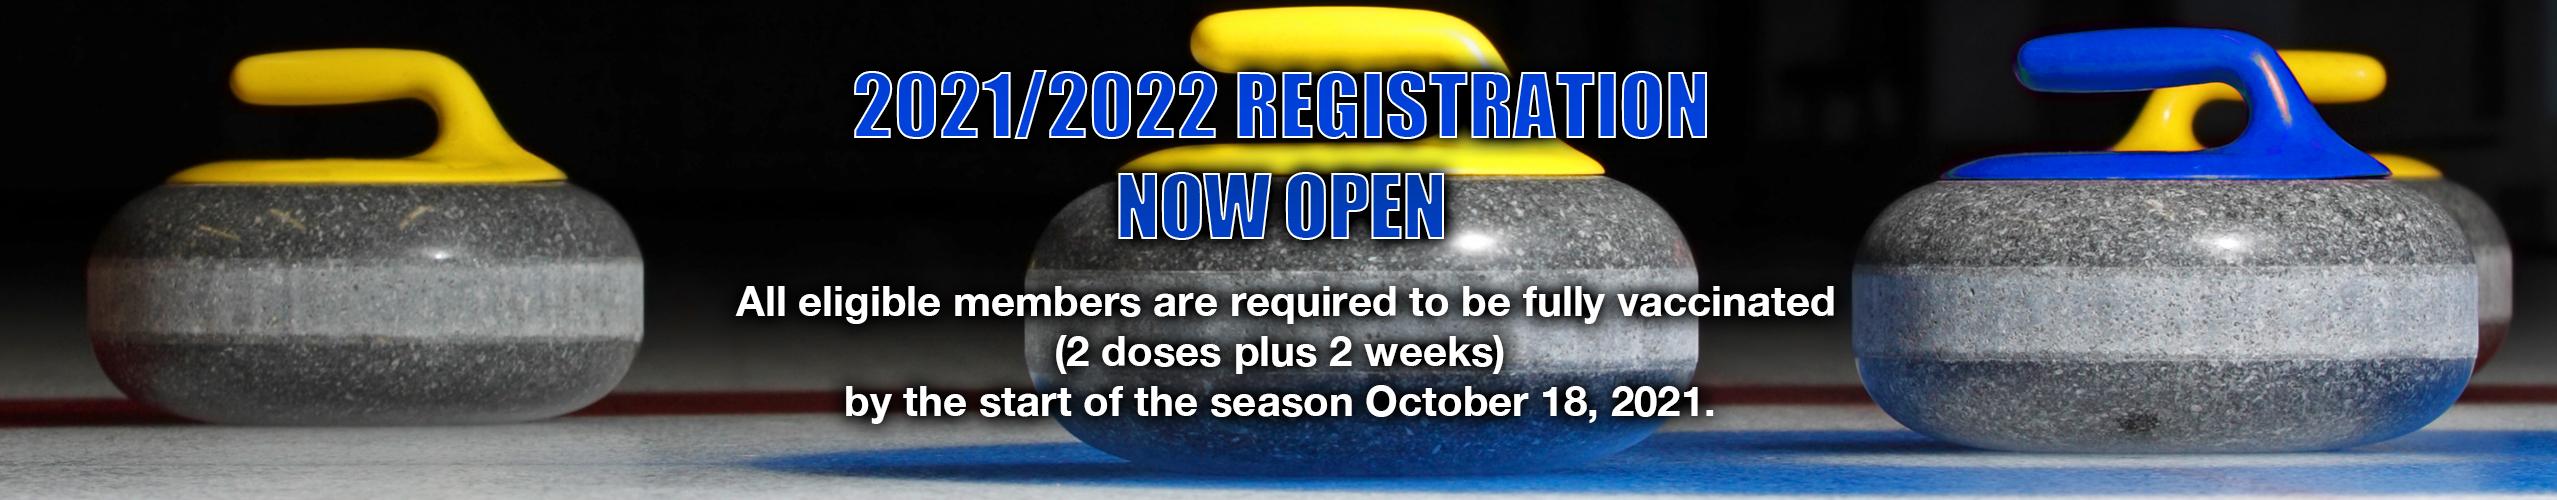 2021-2022_Registration_OPEN_Banner_AD